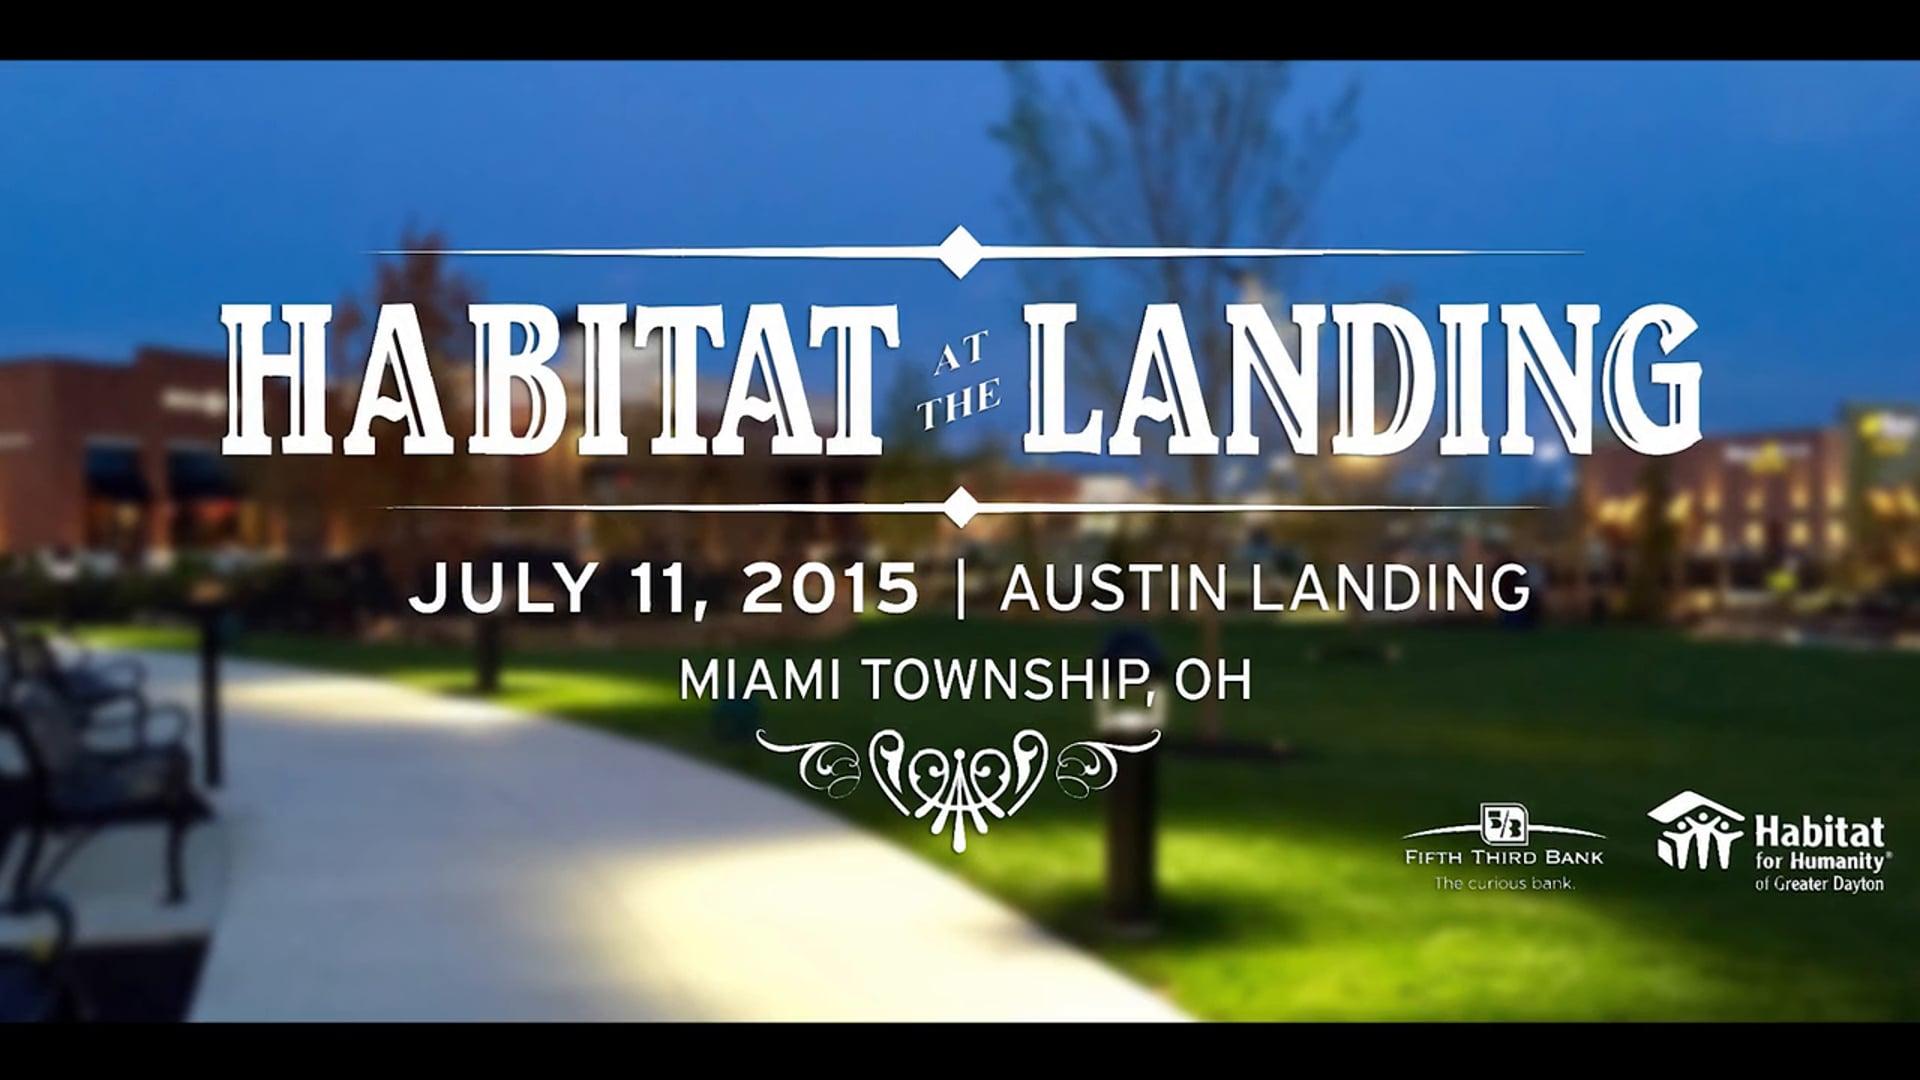 Habitat at the Landing 2015